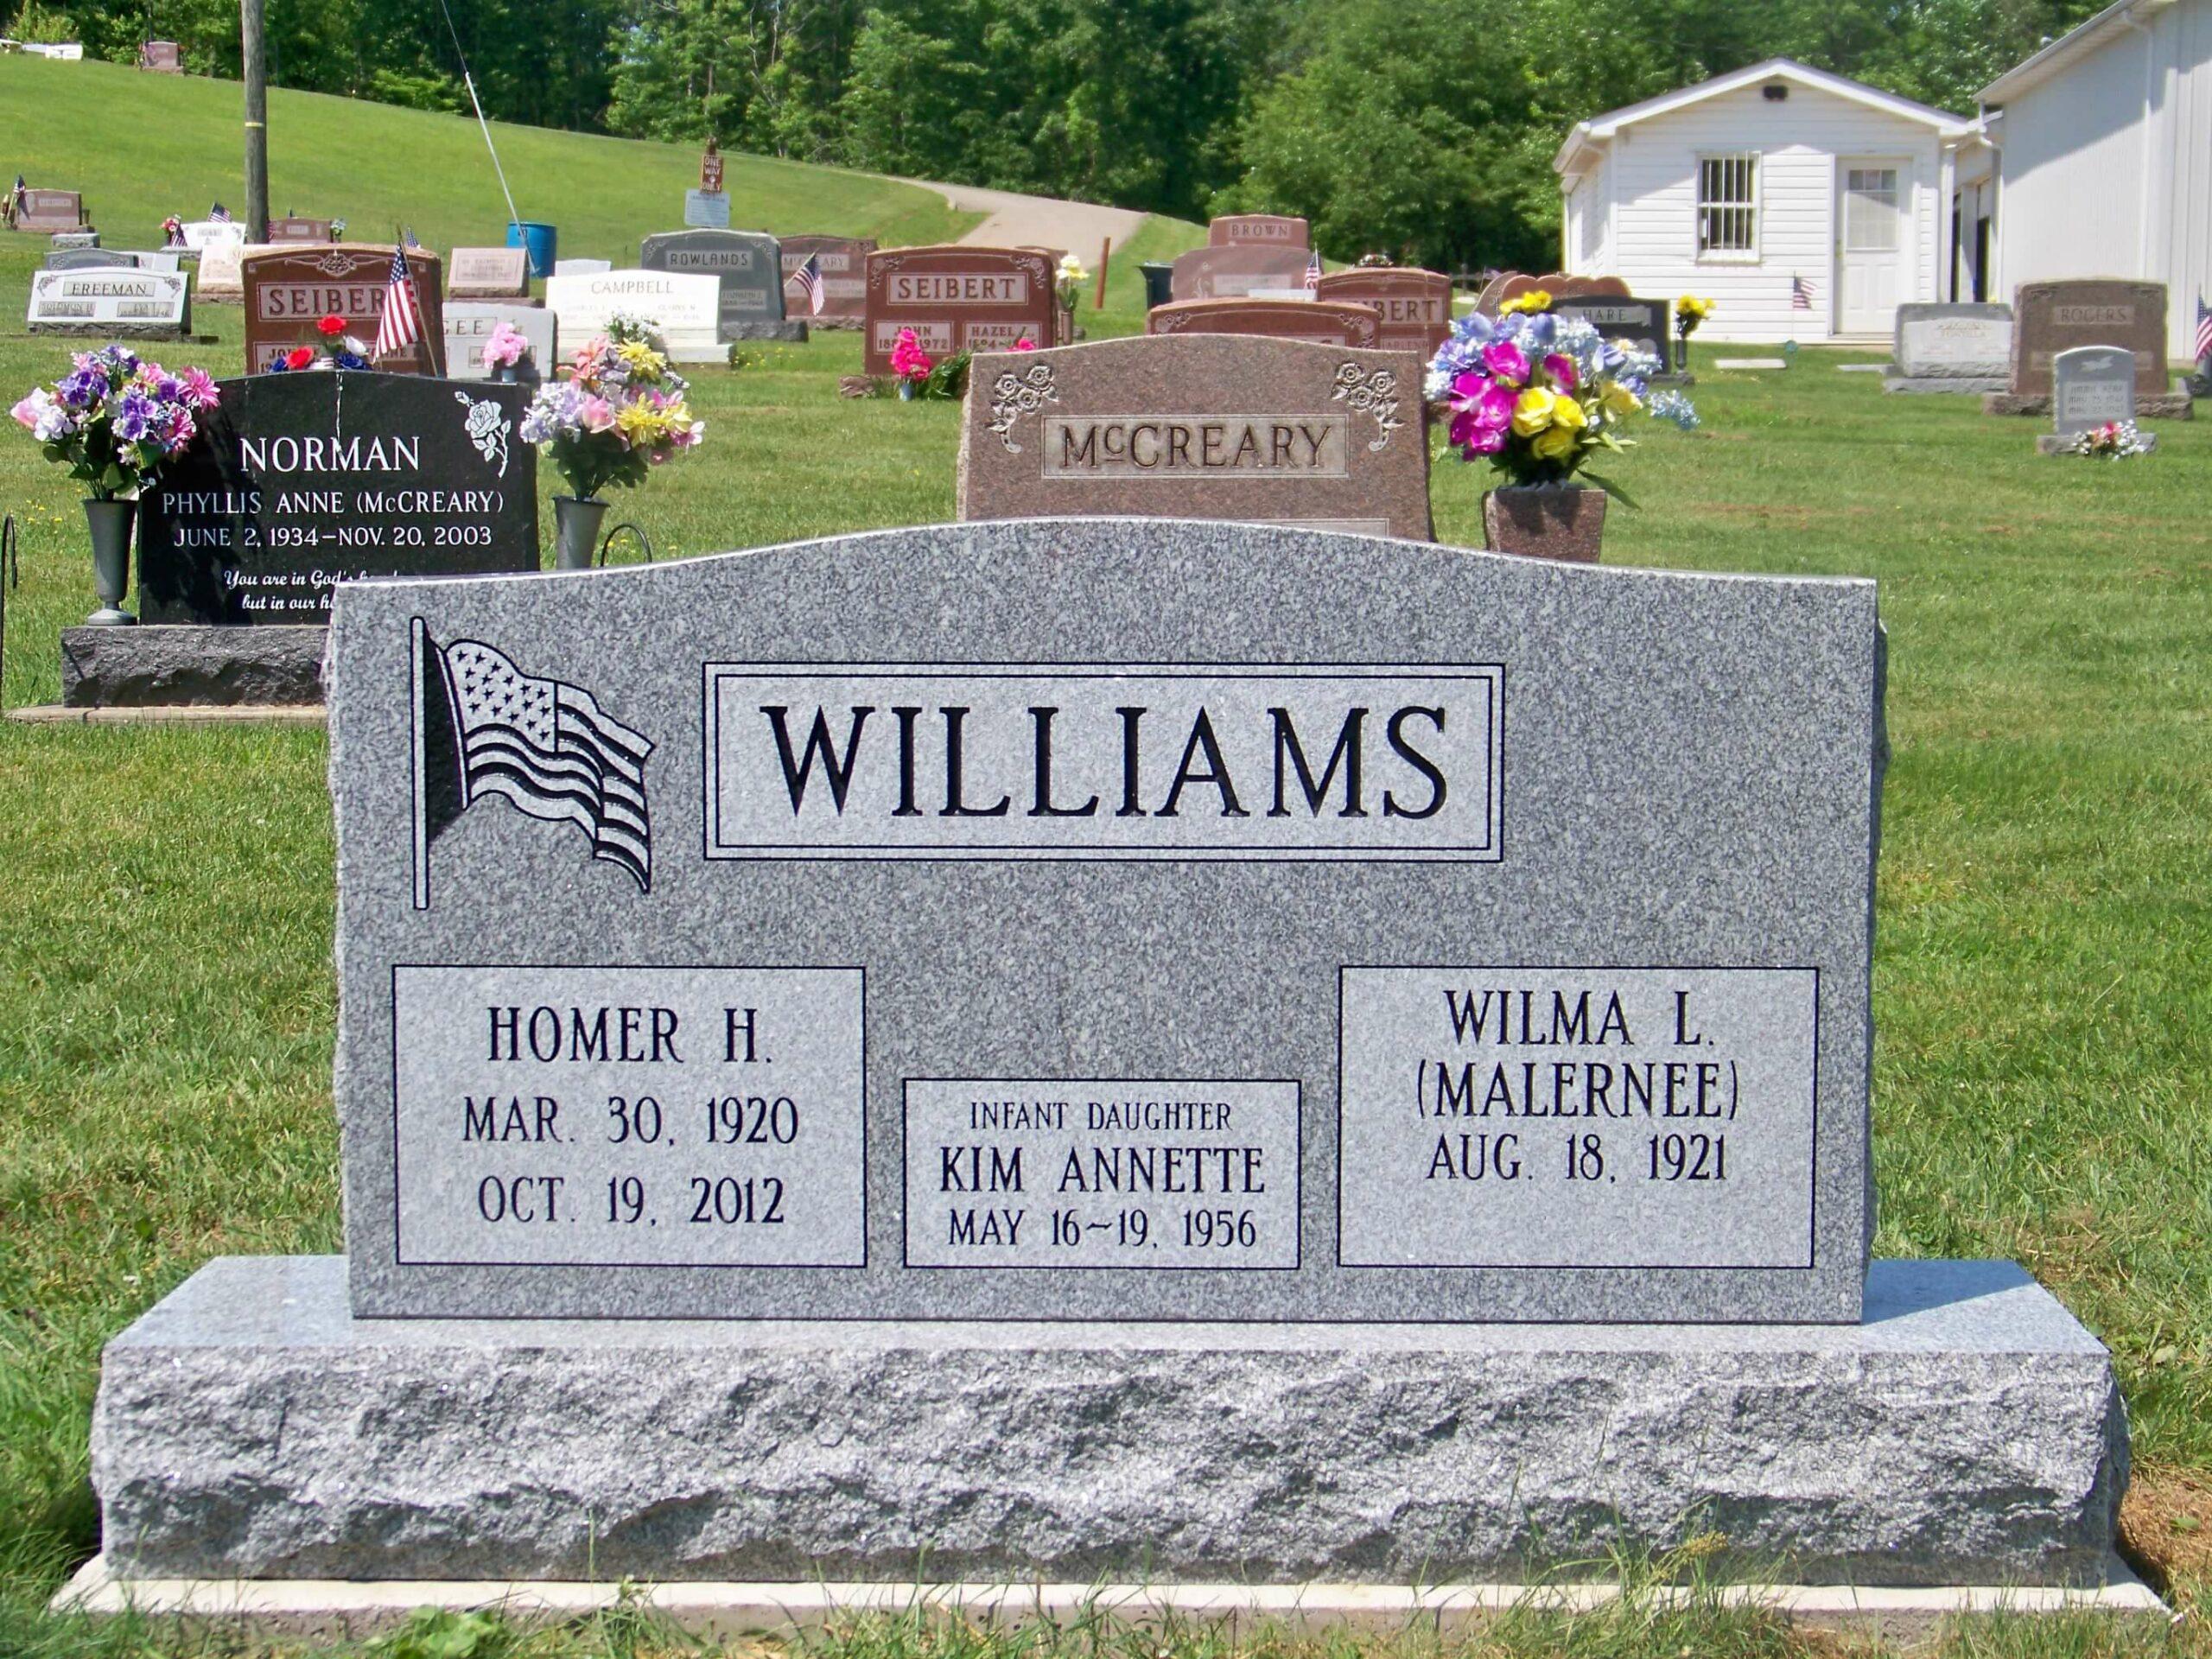 Williams, Homer H., Wilma L.